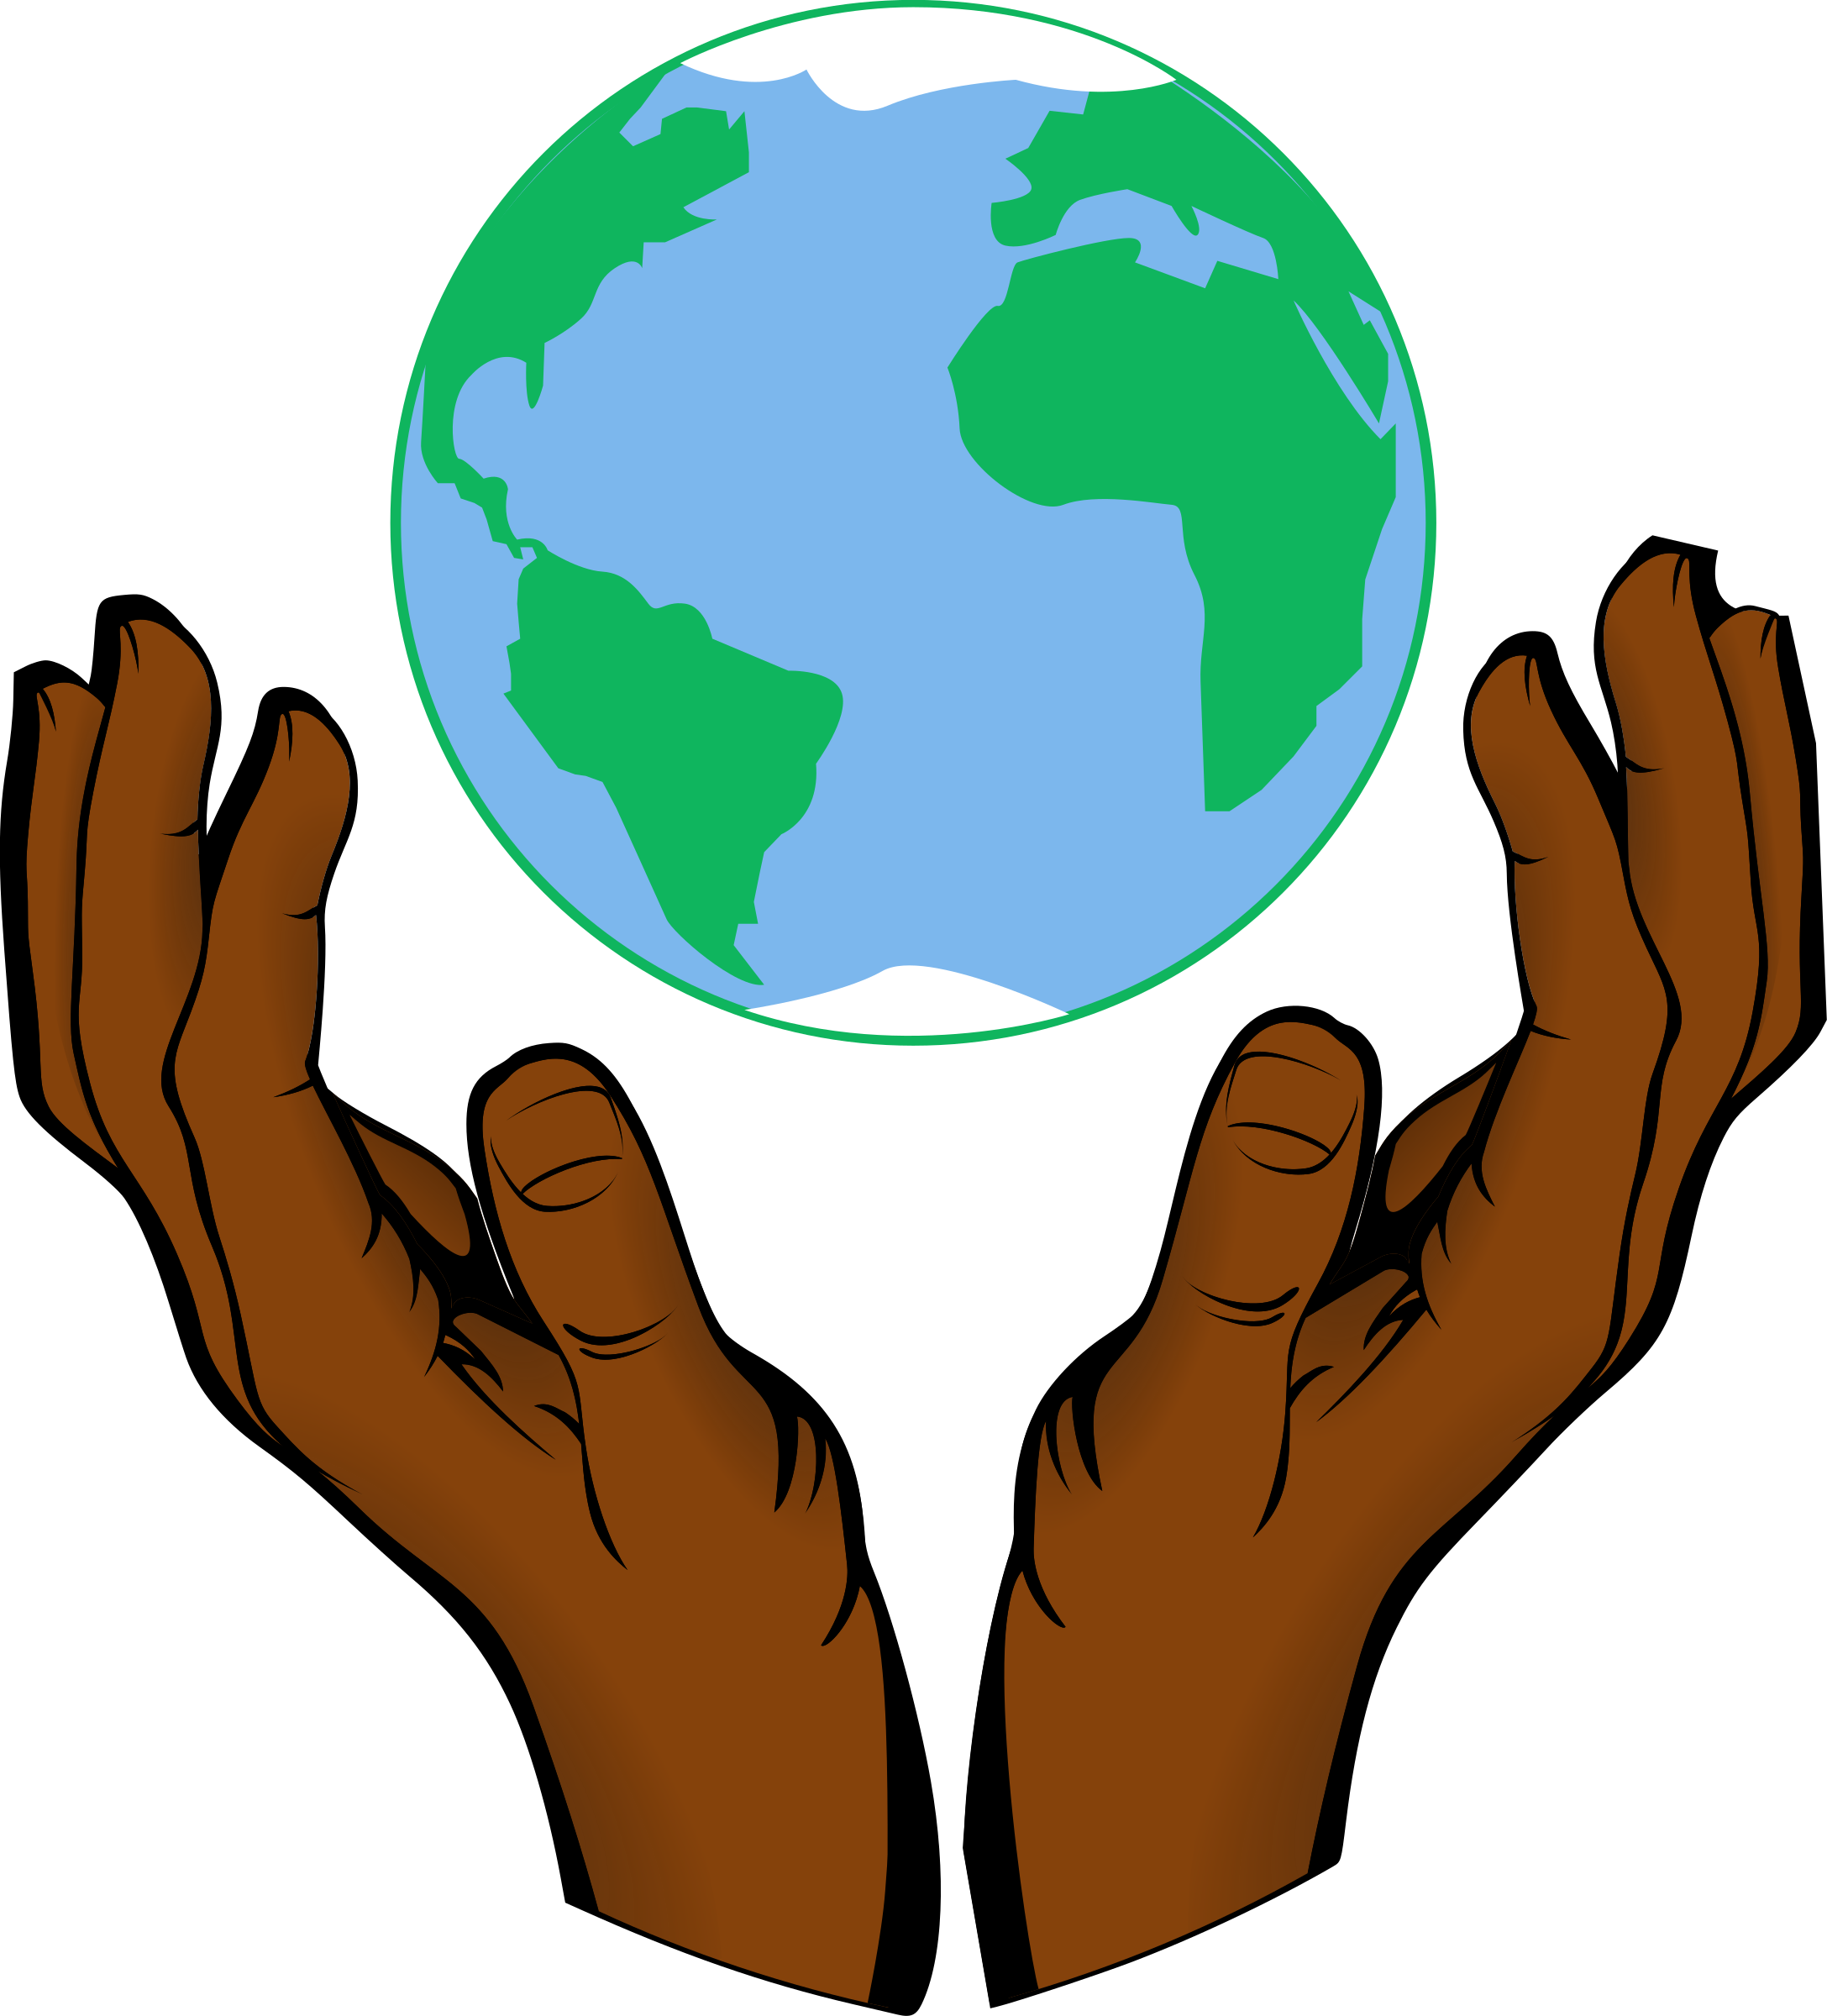 Globe clipart hands holding, Globe hands holding Transparent.